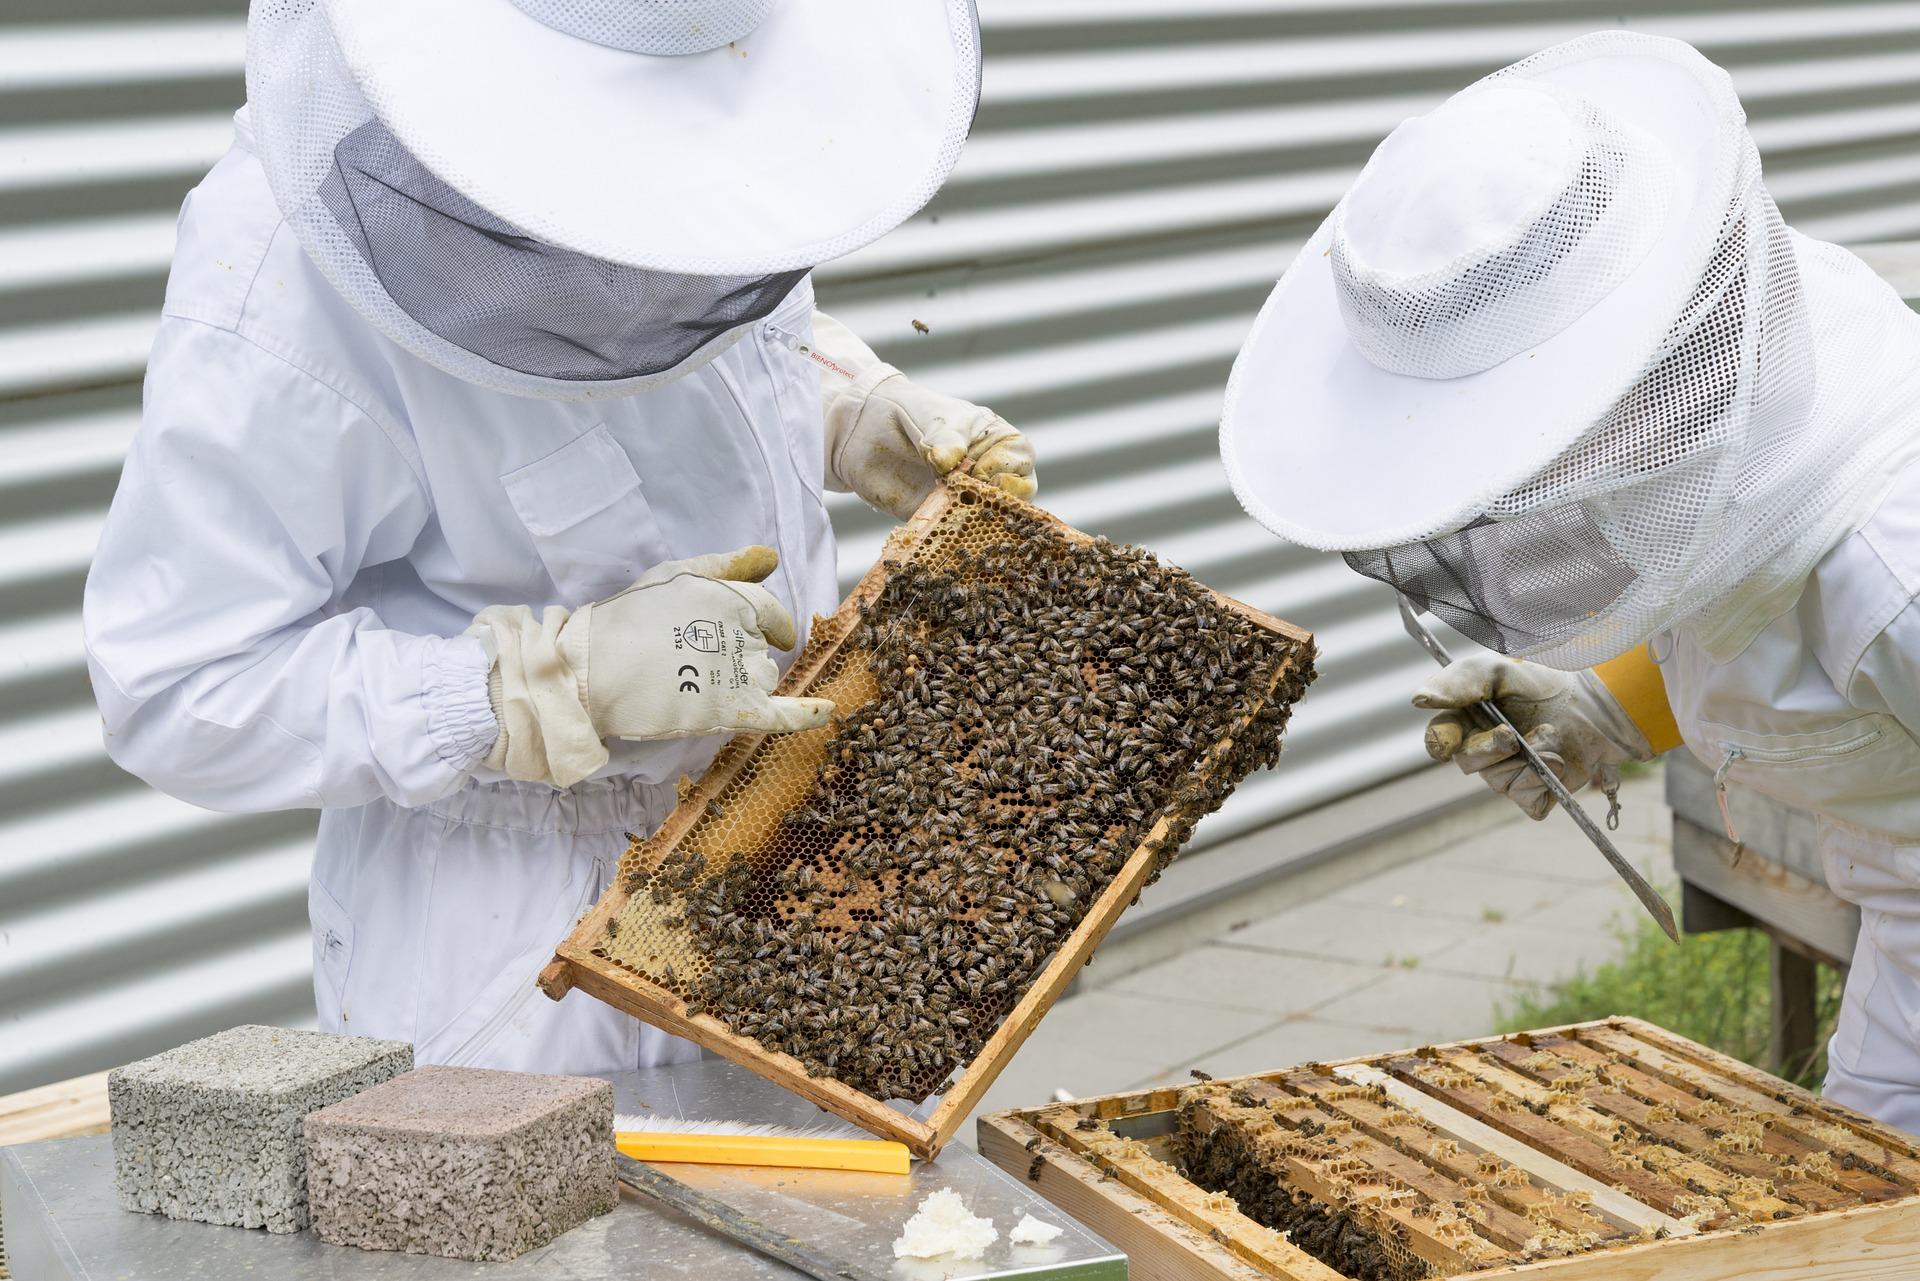 beekeeper 2650663 1920 - Agronomist.gr